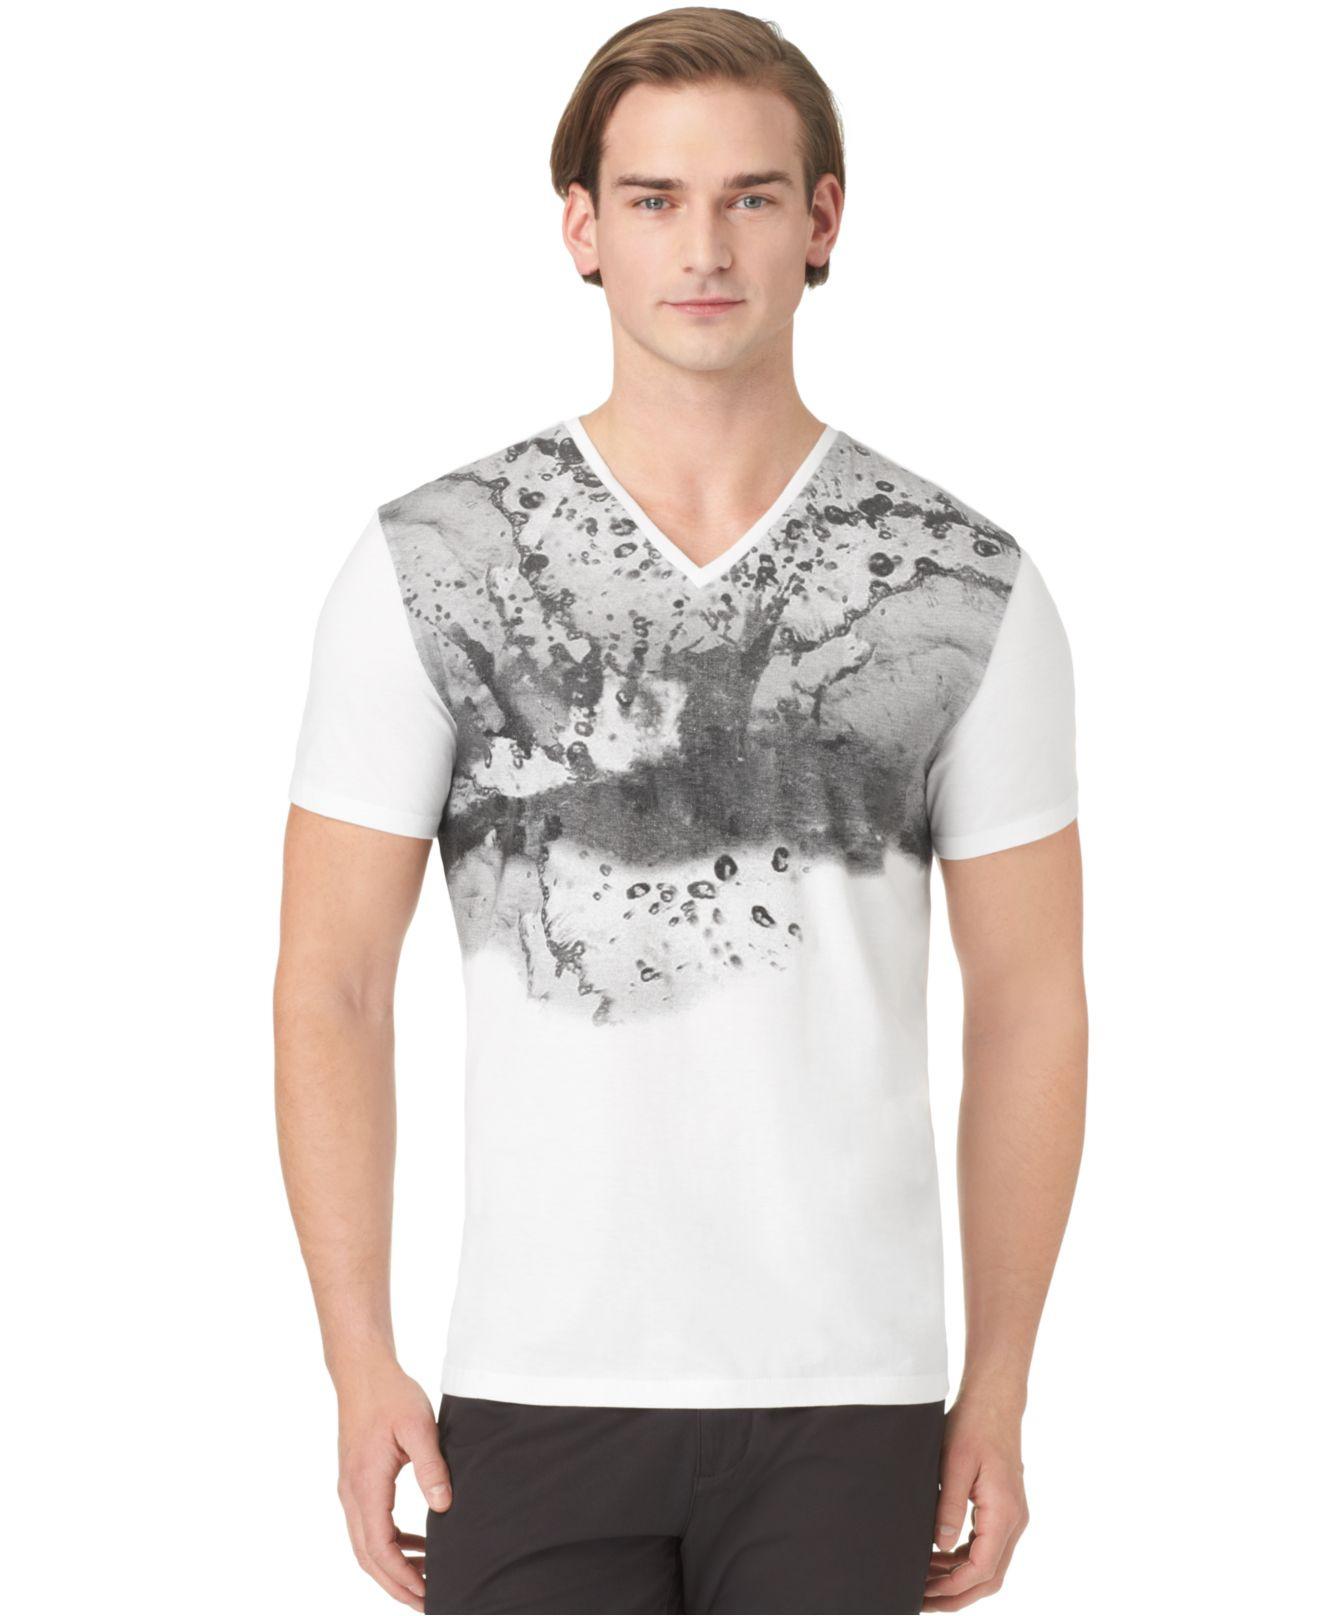 Calvin Klein Water Drop Graphic Slimfit Vneck Tshirt In